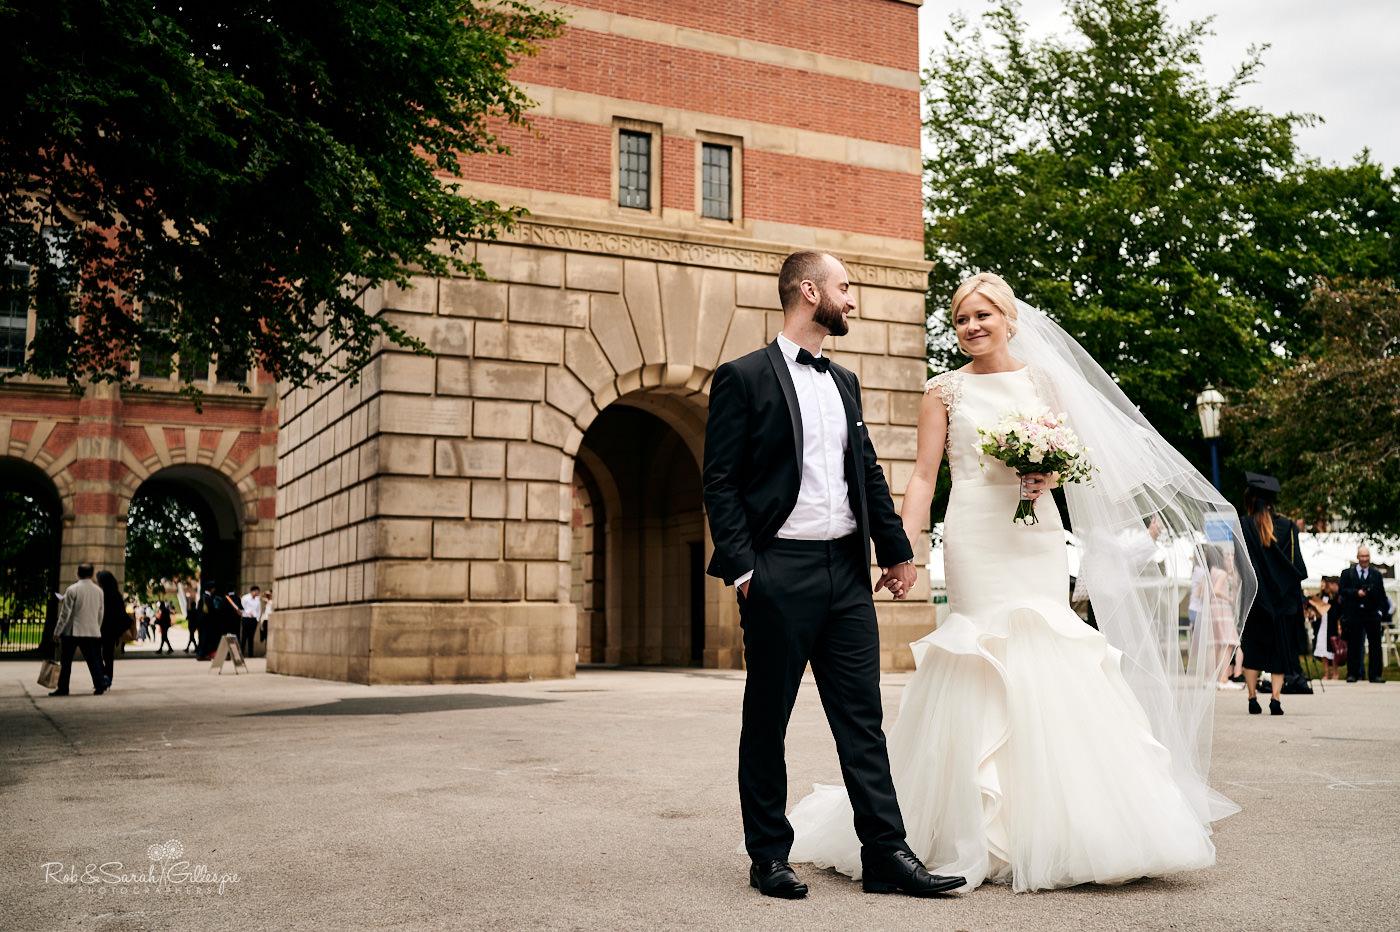 Bride and groom wedding photos inside Birmingham University